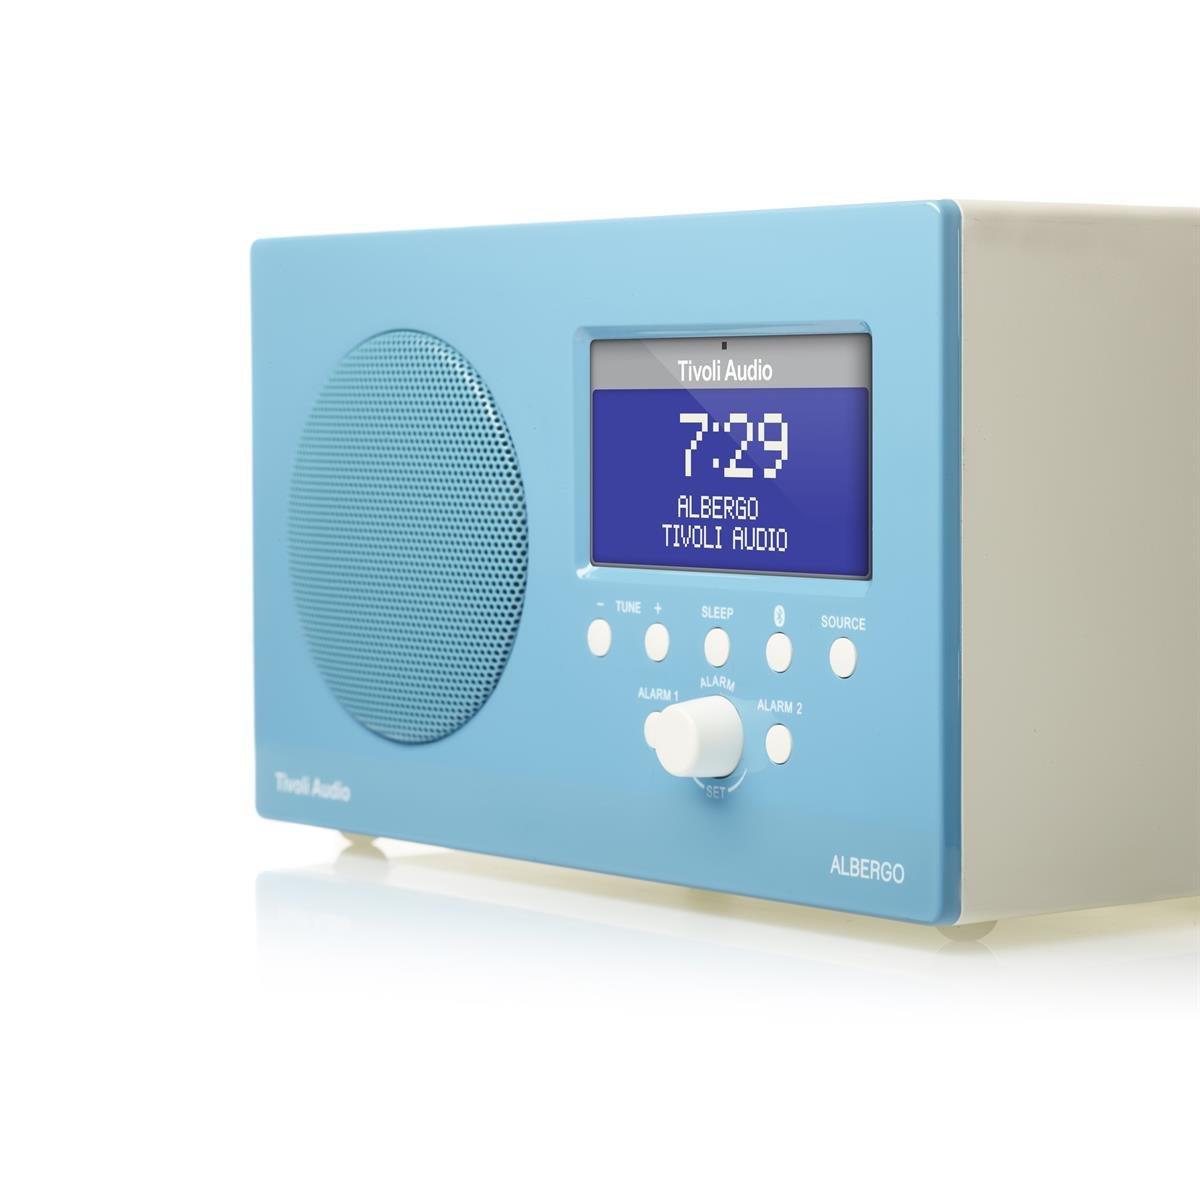 Amazon.com: Tivoli Audio Albergo Bluetooth Clock Radio (Gloss Blue ...